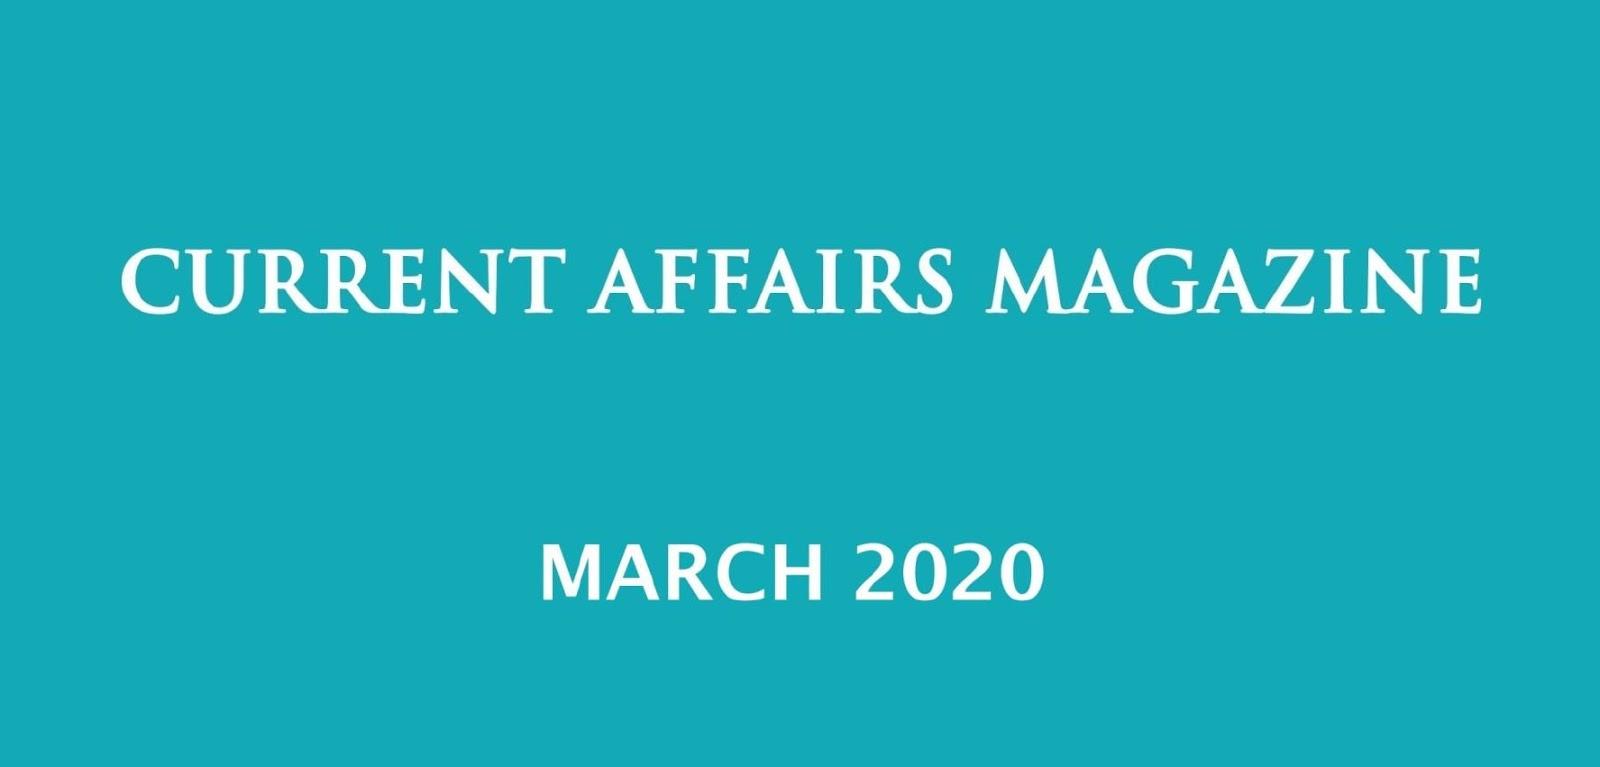 Current Affairs March 2020 iasparliament